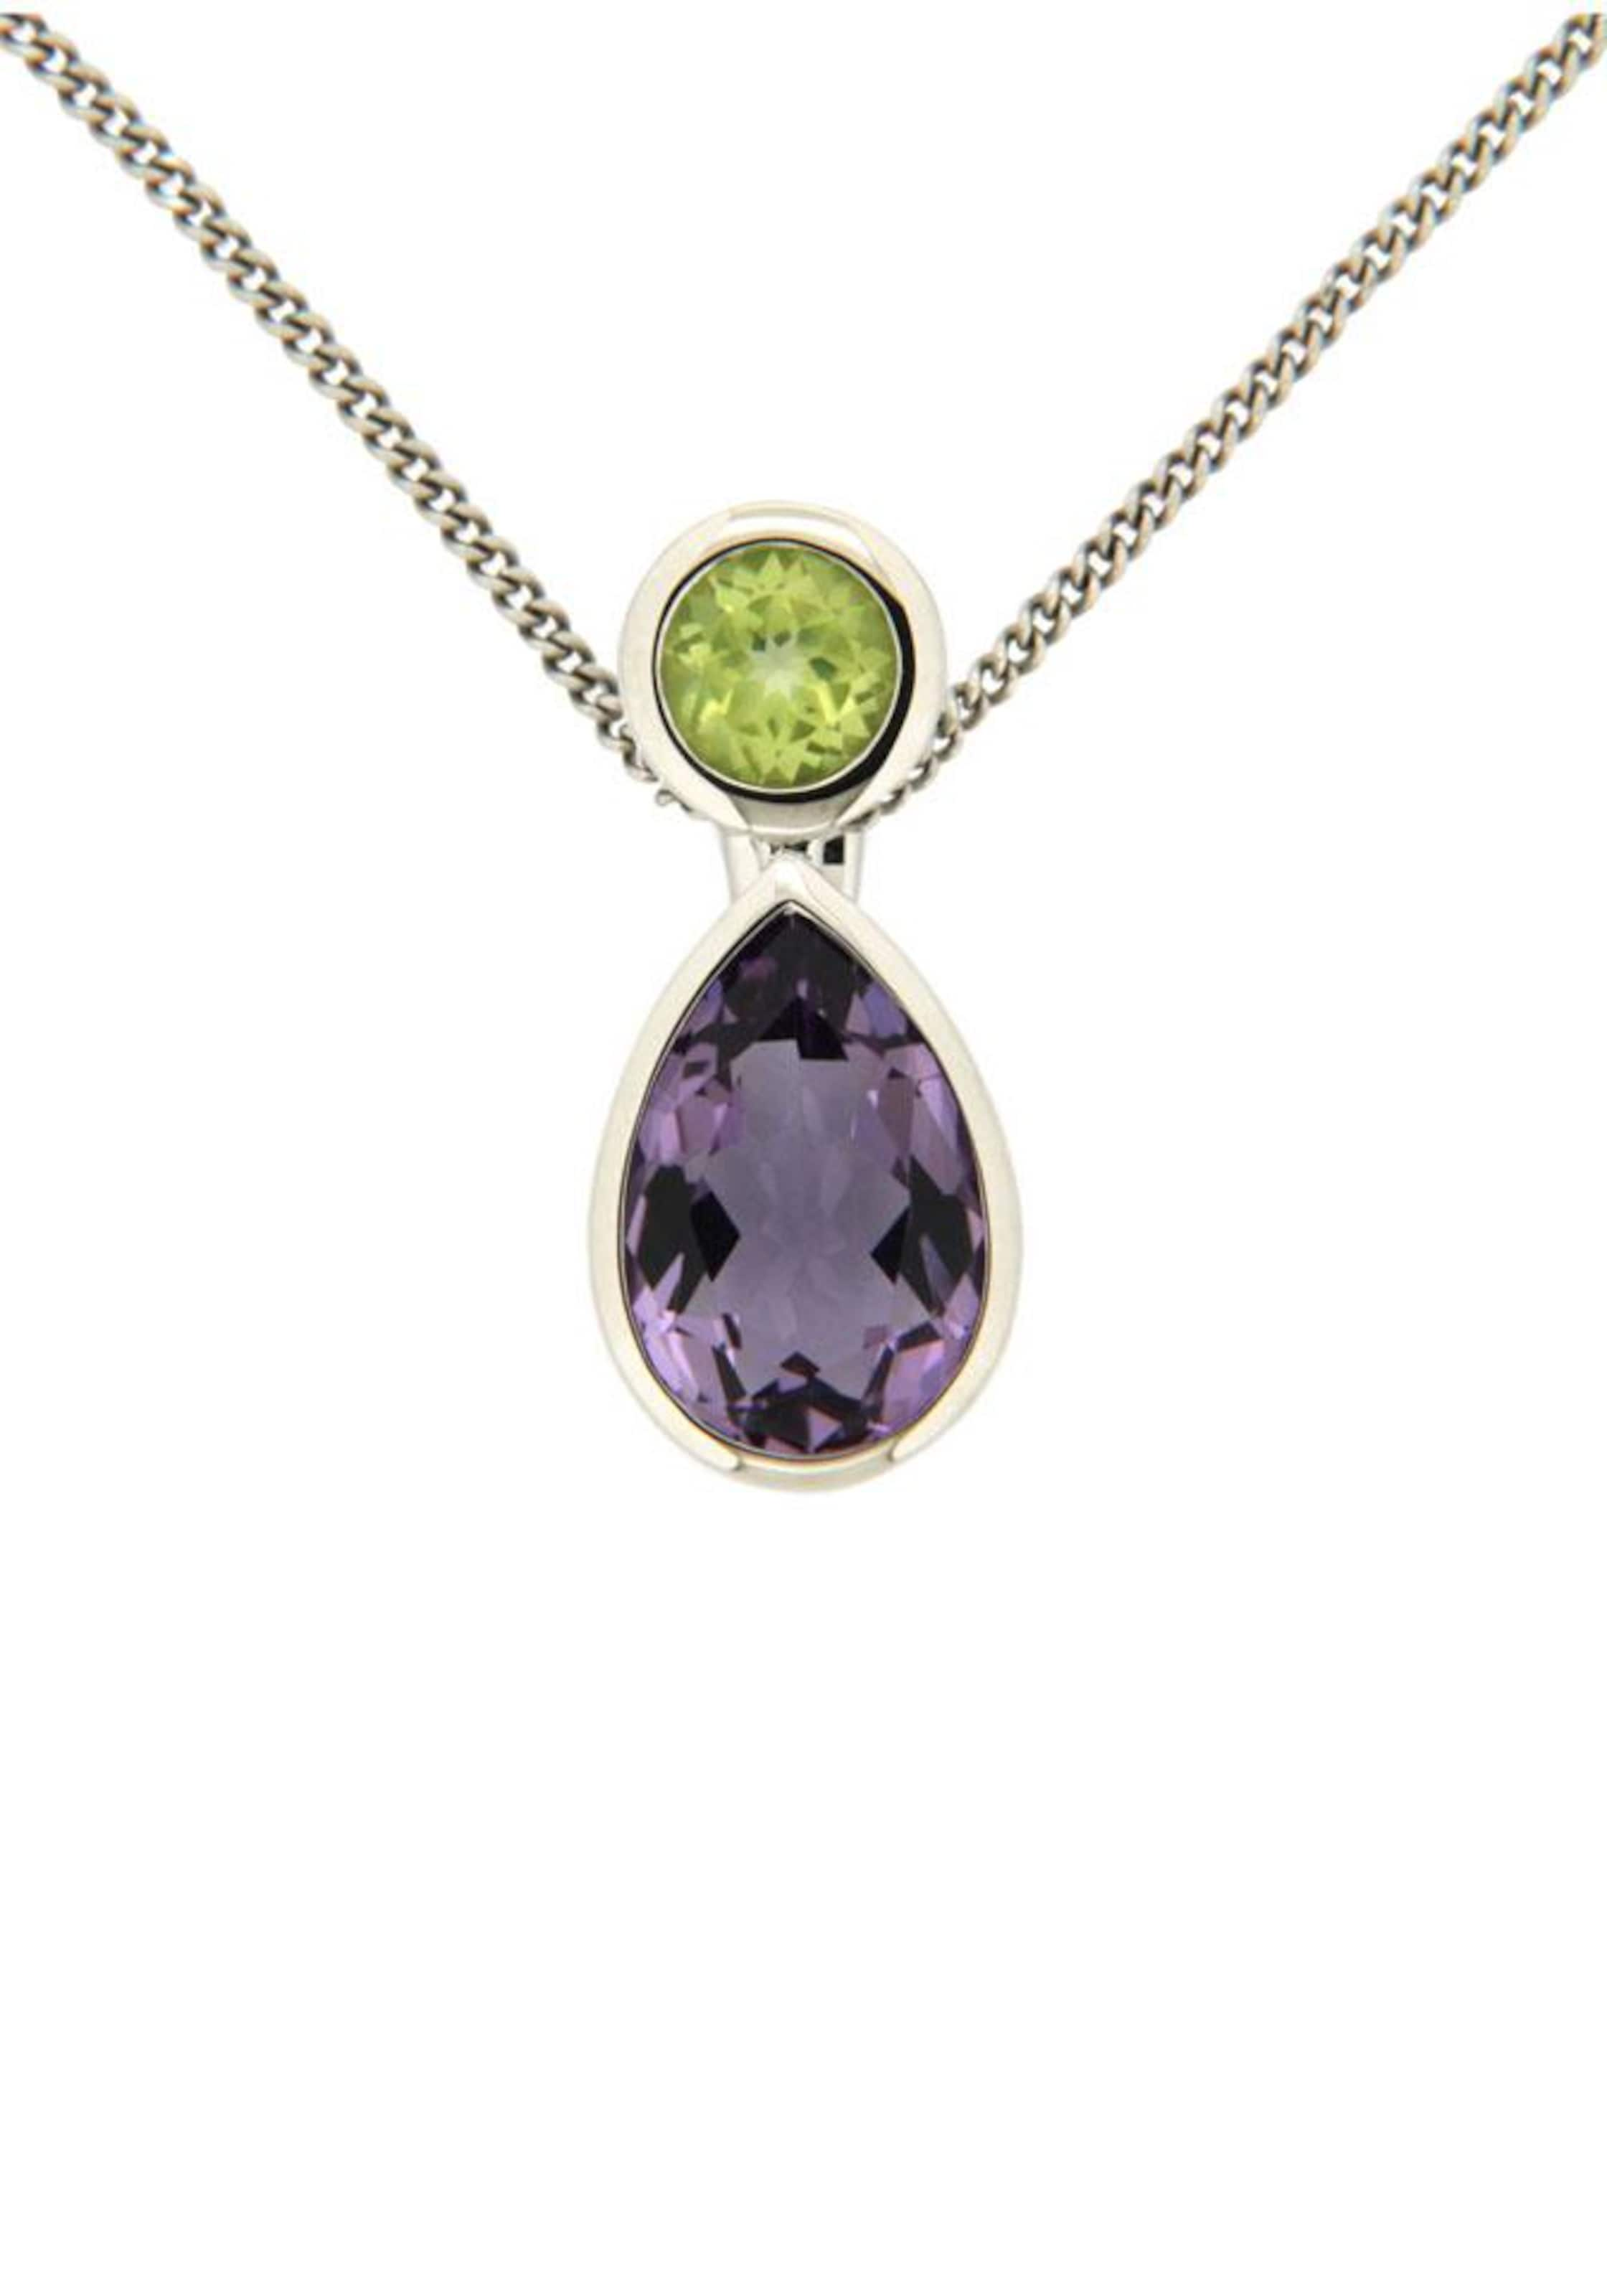 VIVANCE jewels Kettenanhänger Kaufen Online-Outlet 6UilY3Nzzx